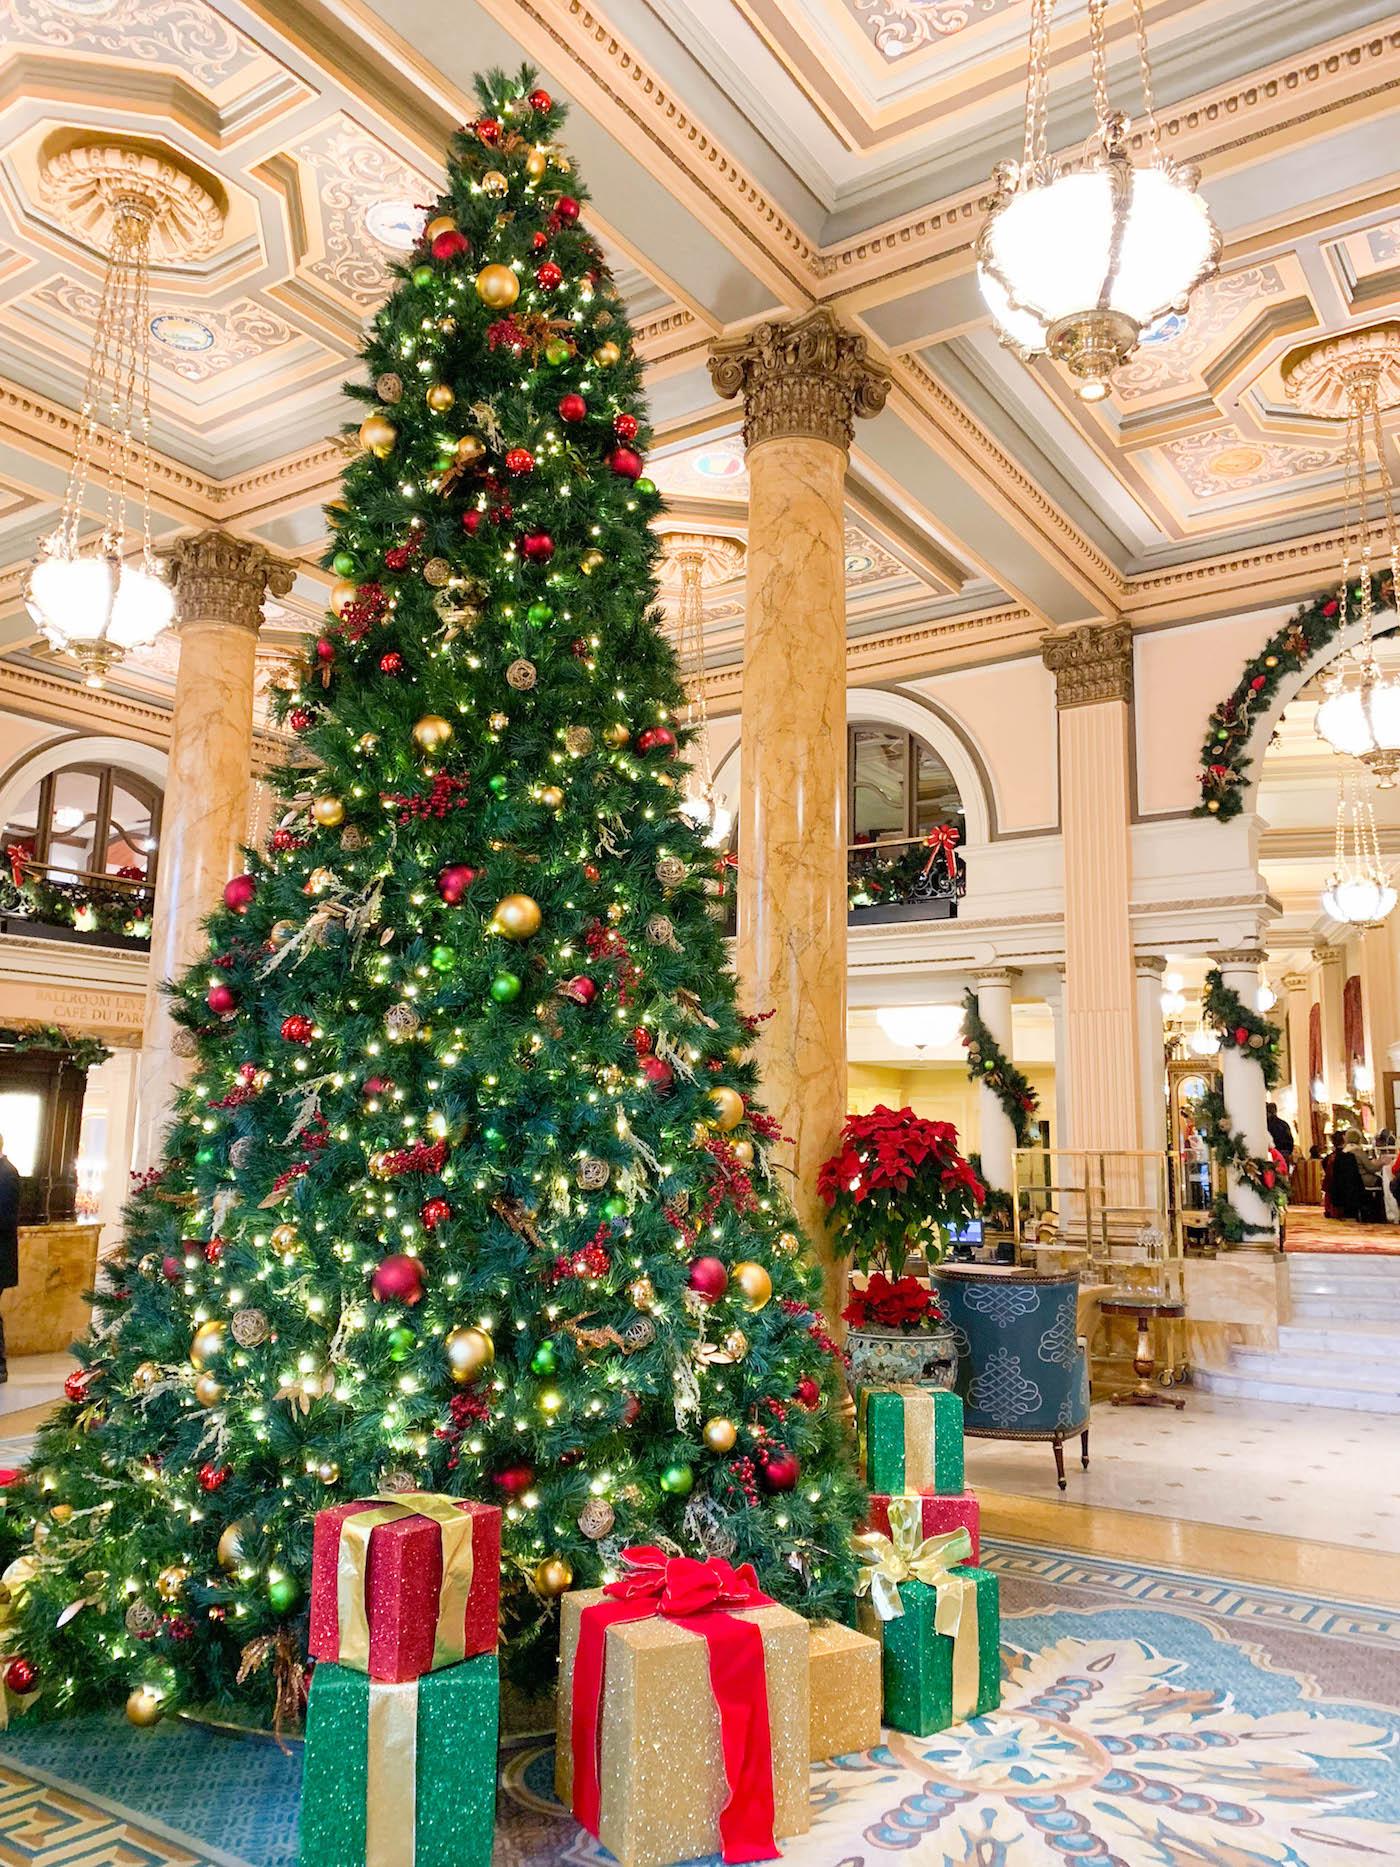 willard hotel christmas decorations